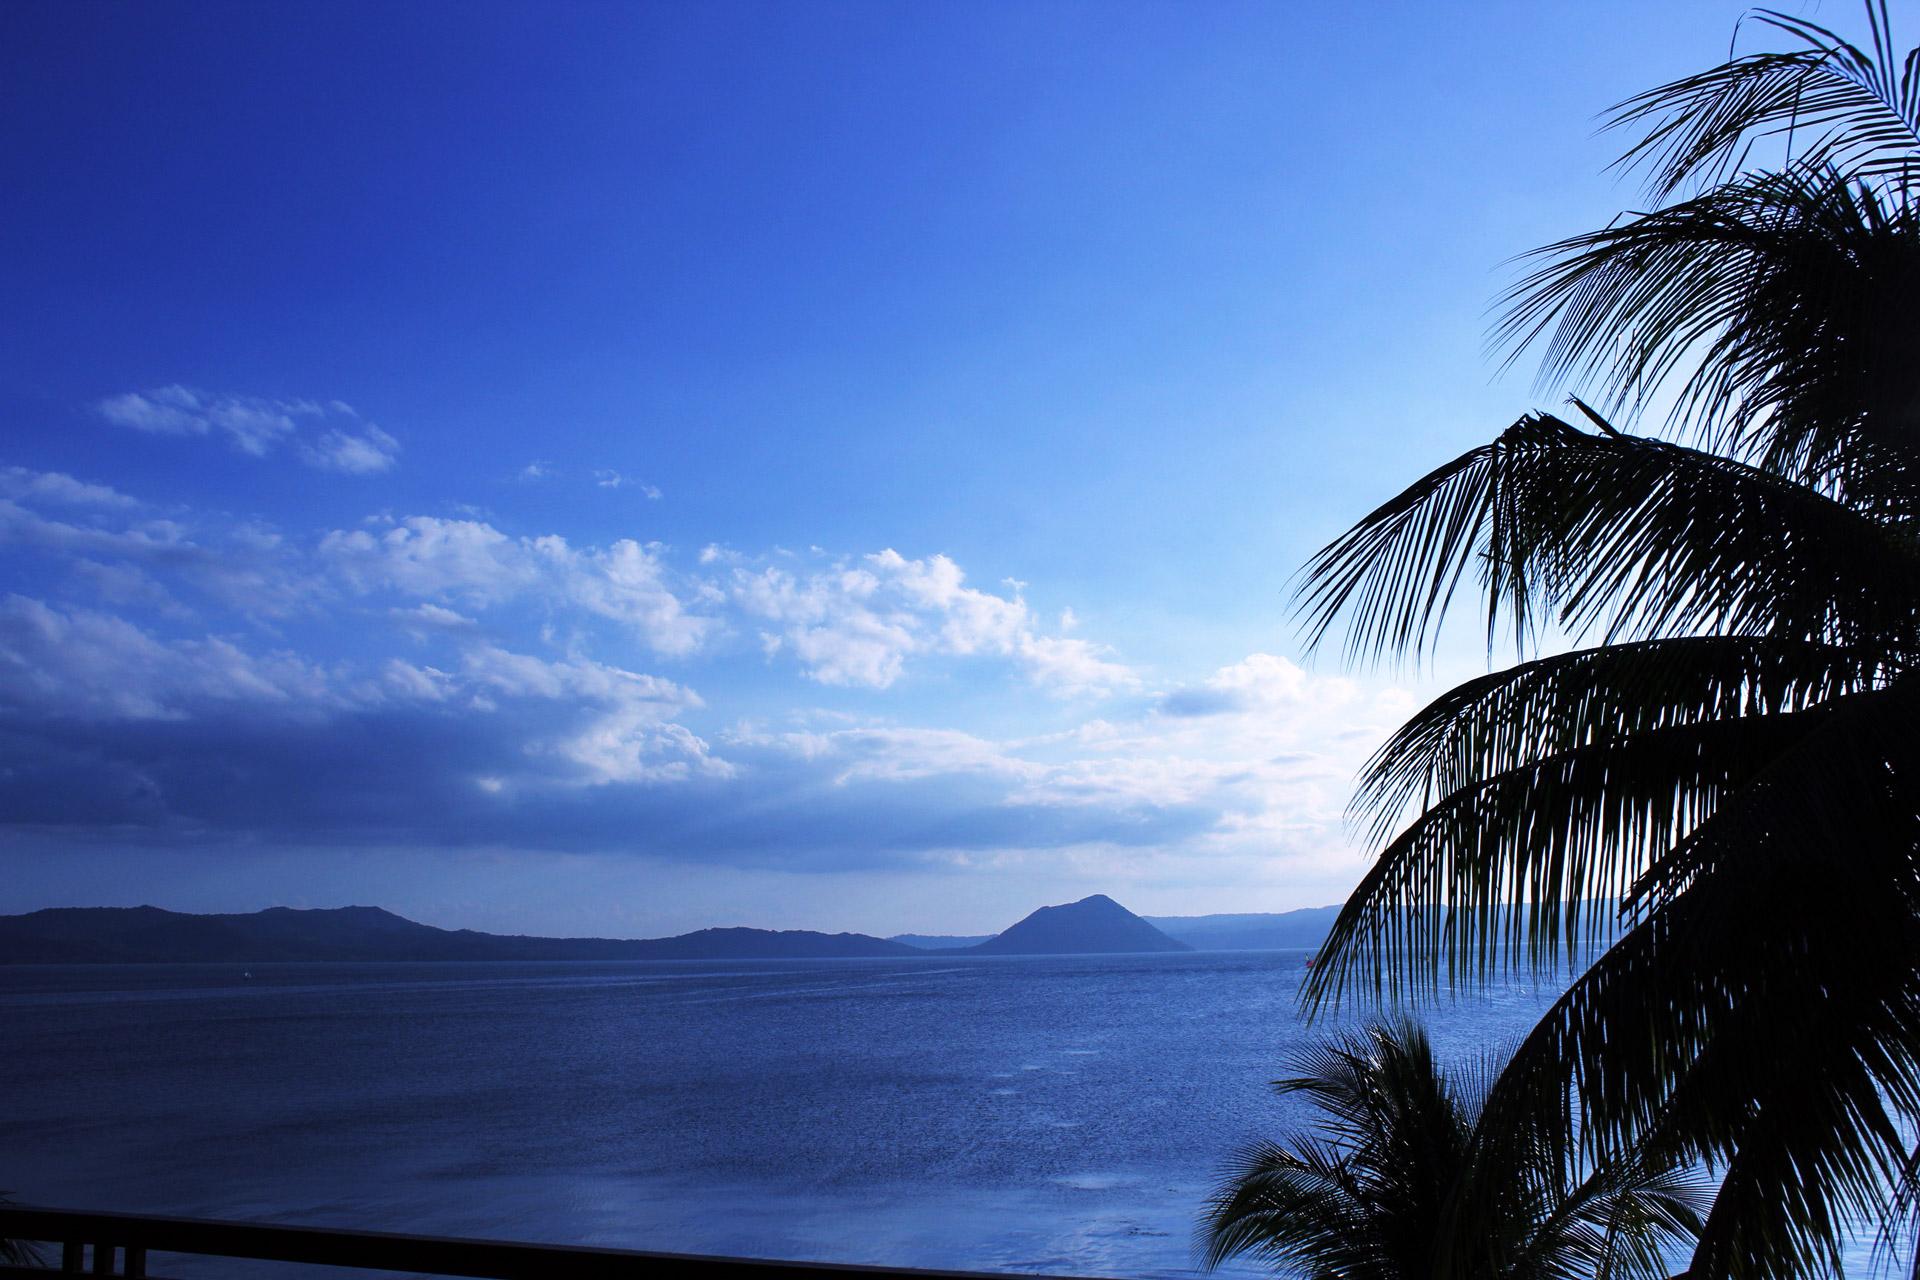 Creation, Ocean, Nature